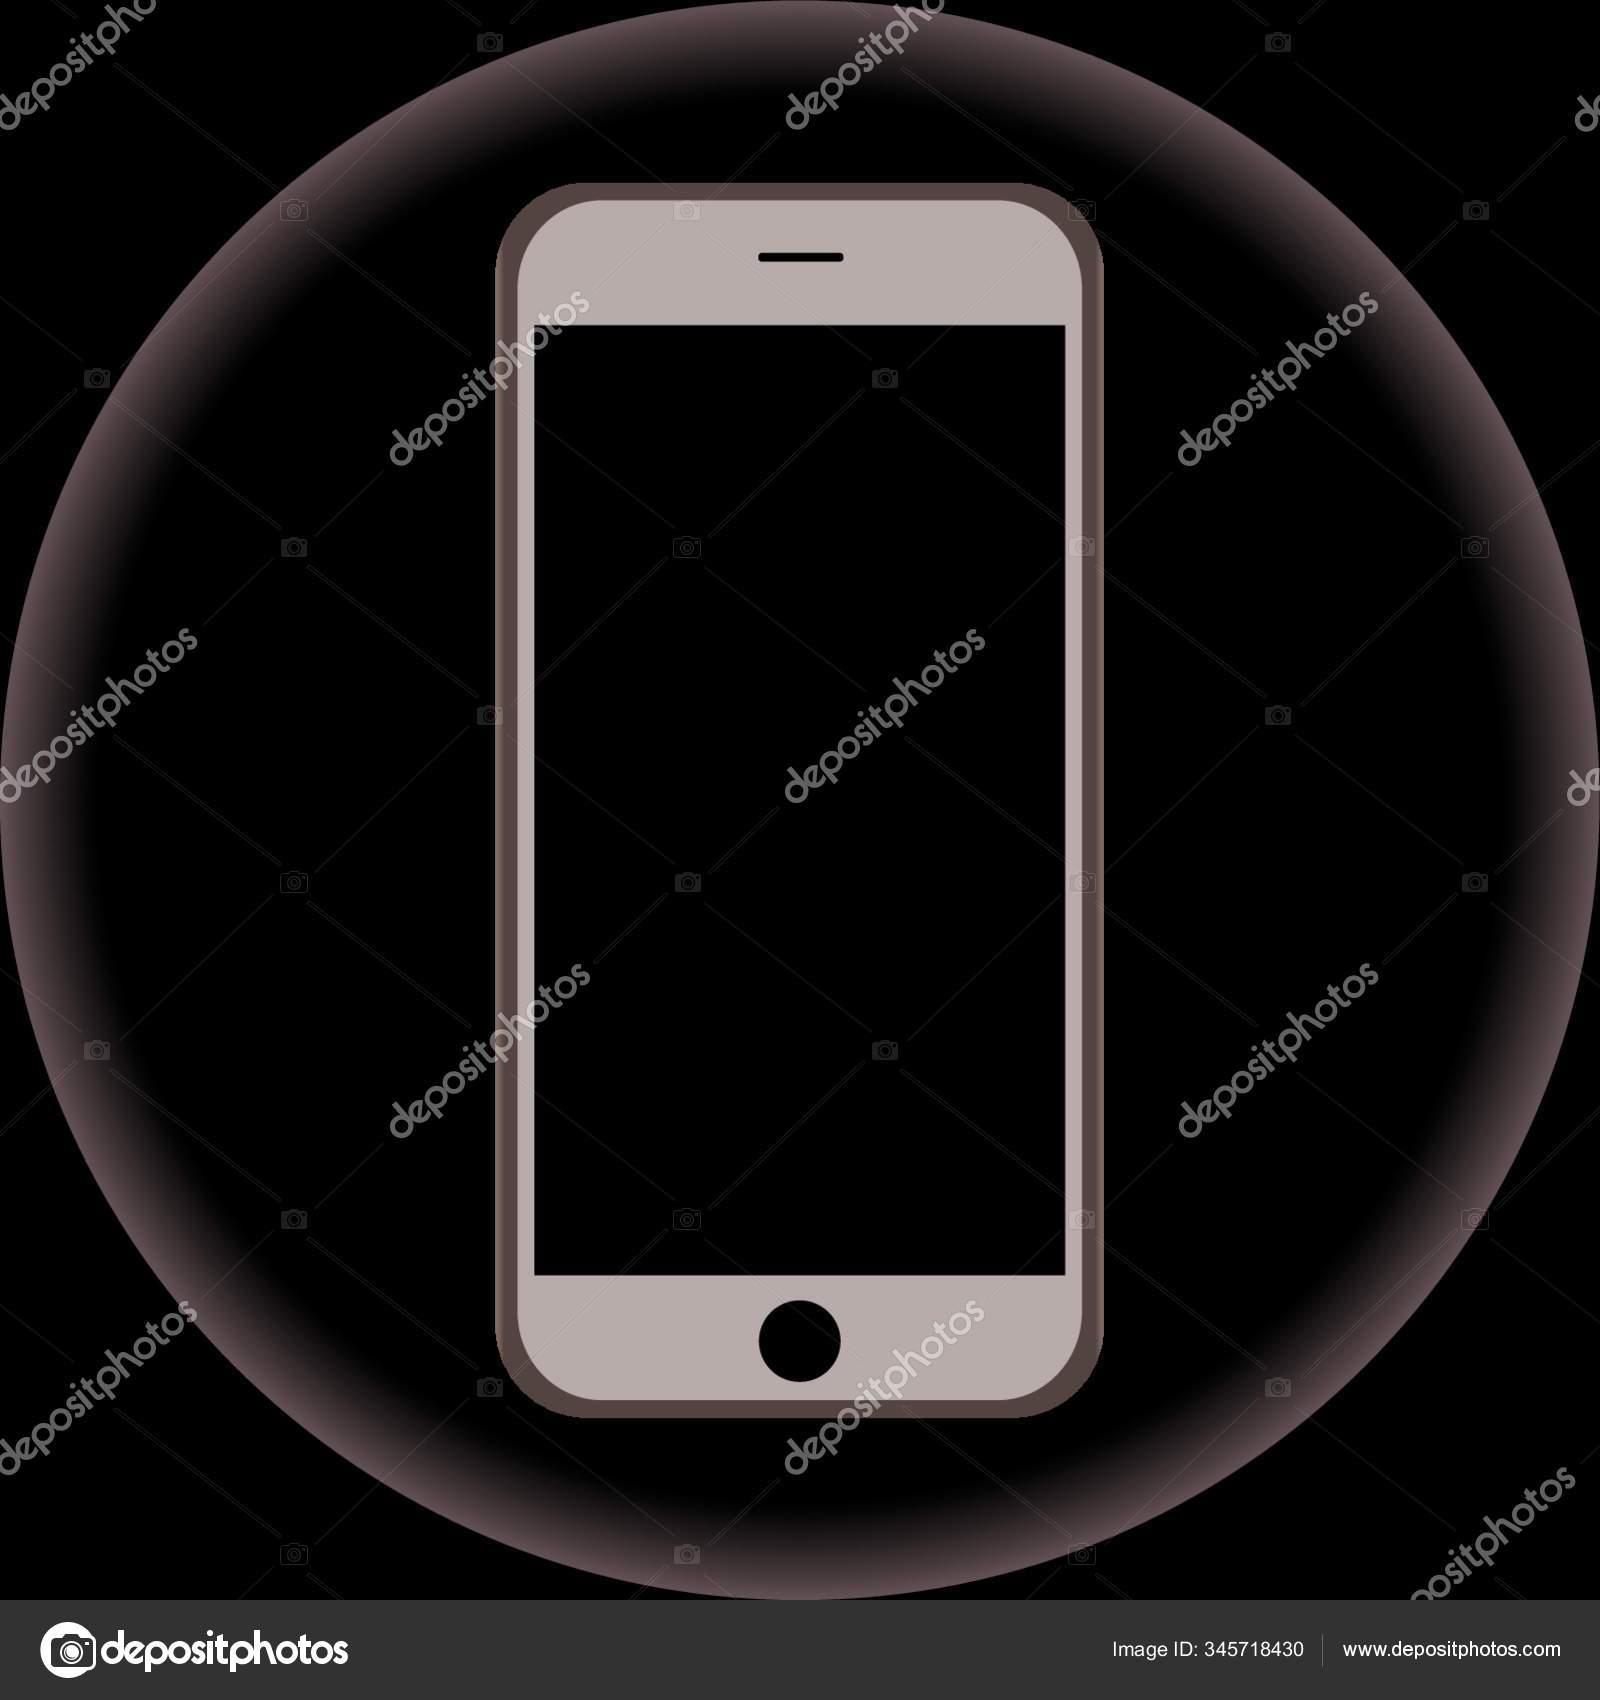 ikon ponsel smartphone gambar vektor eps10 stok vektor c yayimages 345718430 https id depositphotos com 345718430 stock illustration smartphone icon mobile phone vector html